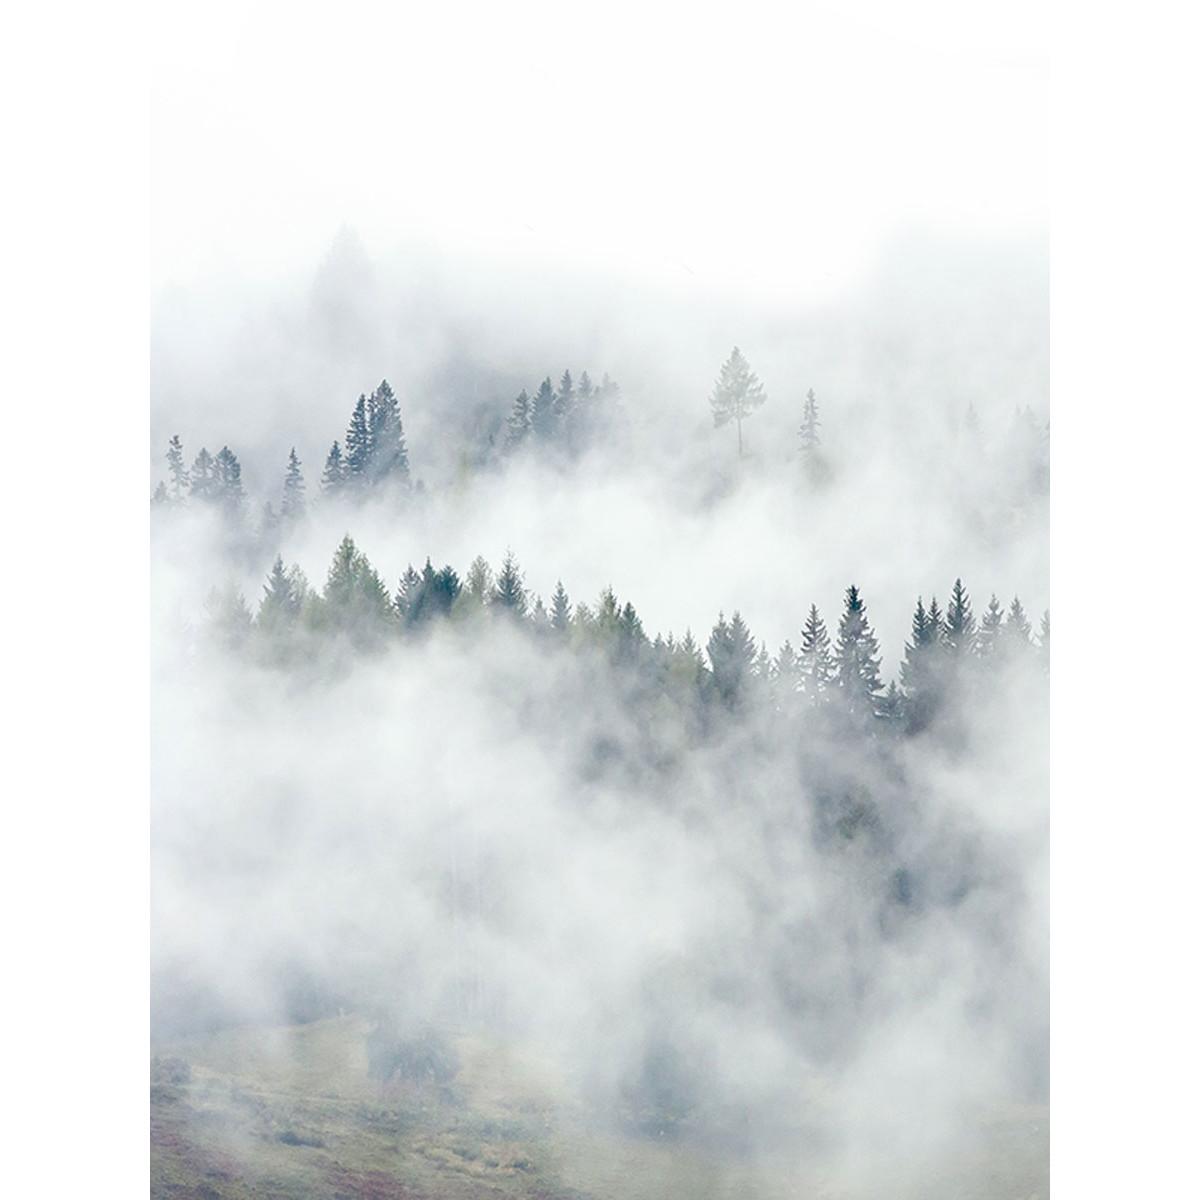 Фотообои Fotooboikin Туман fot-9333 200х270 см